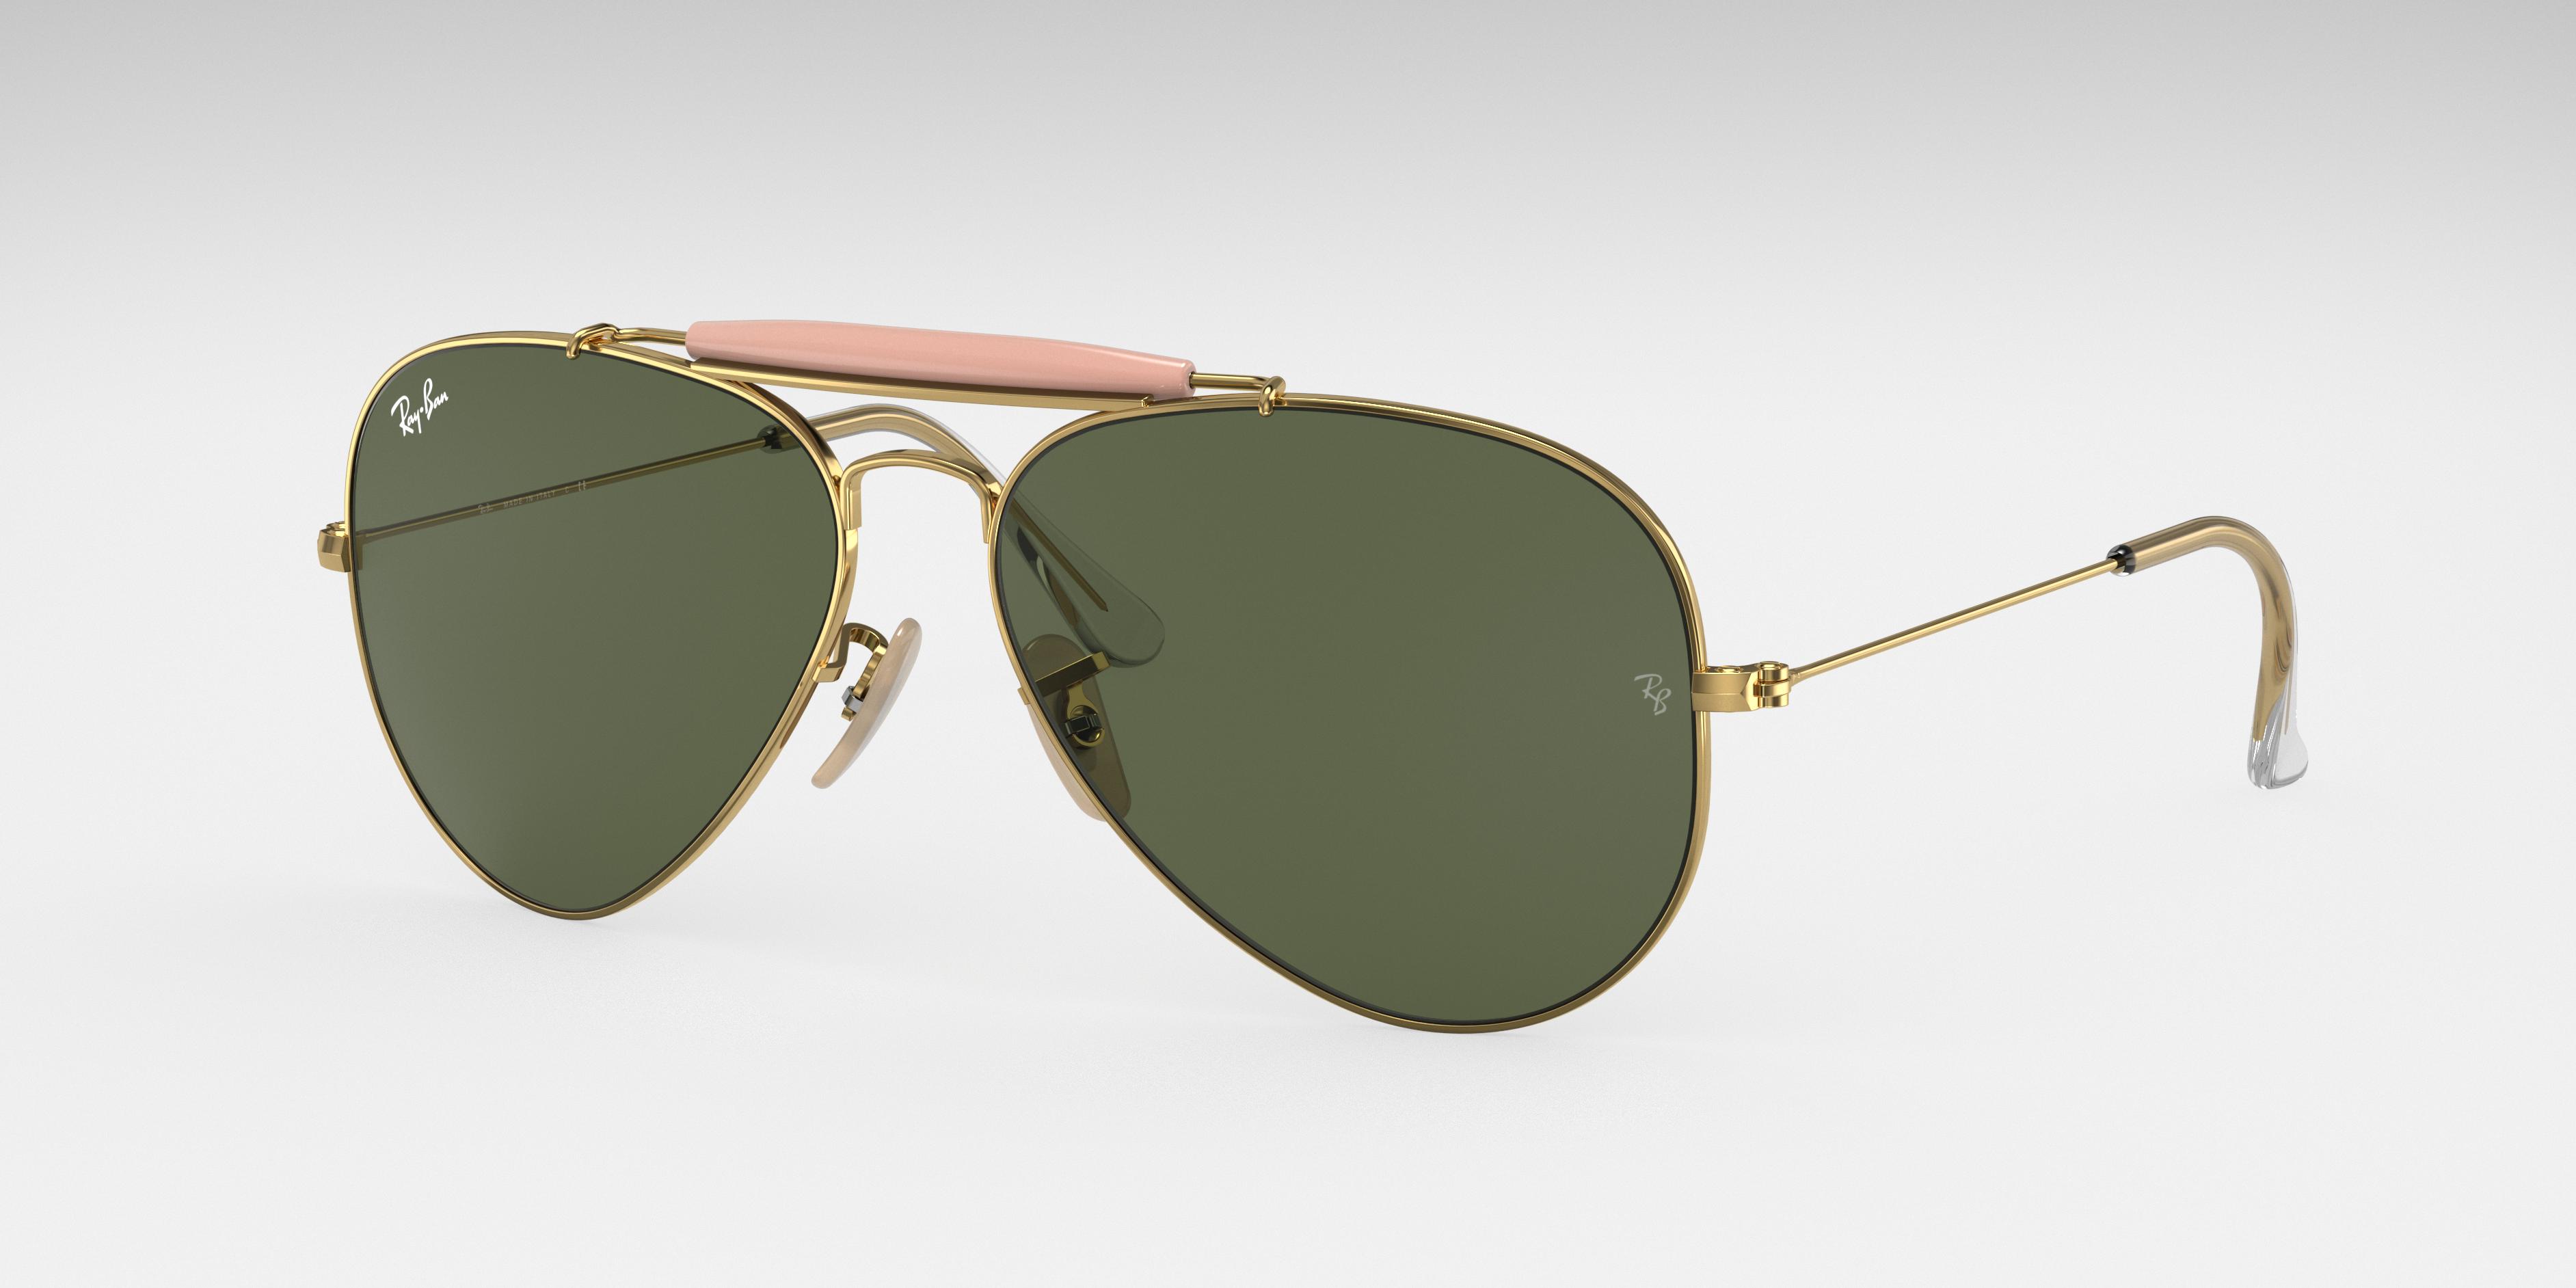 Ray-Ban Outdoorsman II Gold, Green Lenses - RB3029